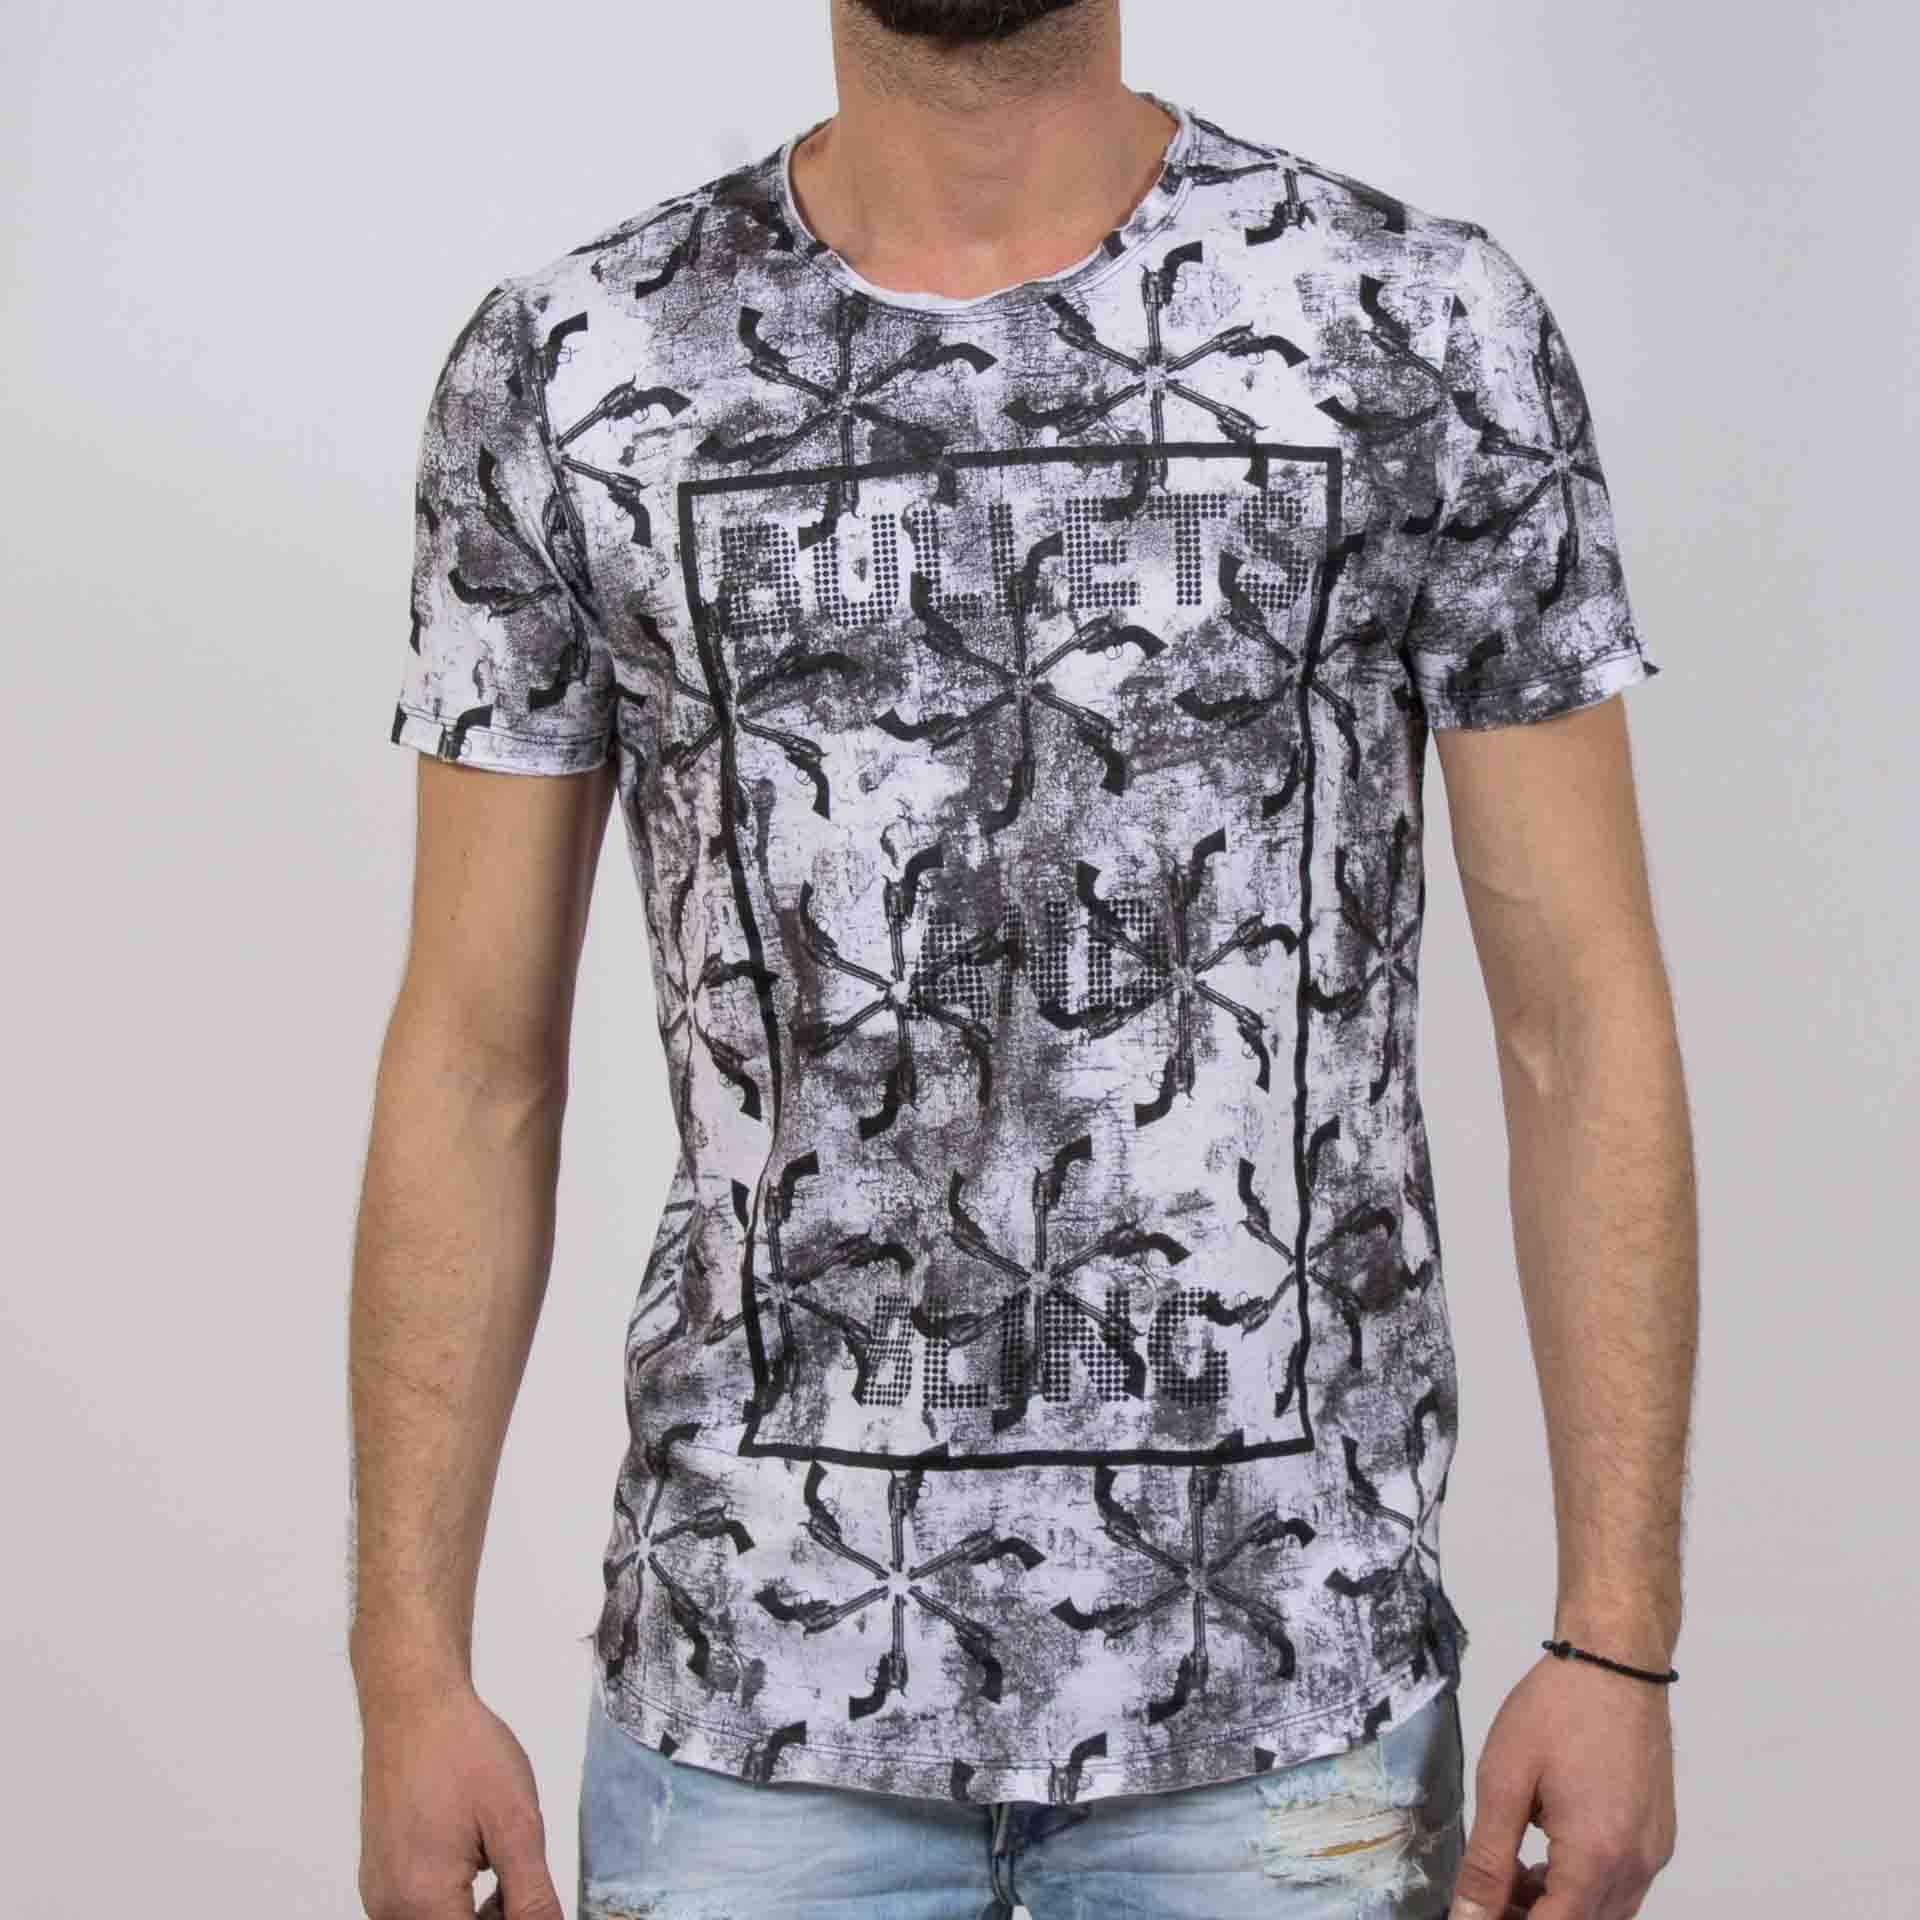 bebeb737dba8 Ανδρική μπλούζα T-Shirt  Hashtag Bullets